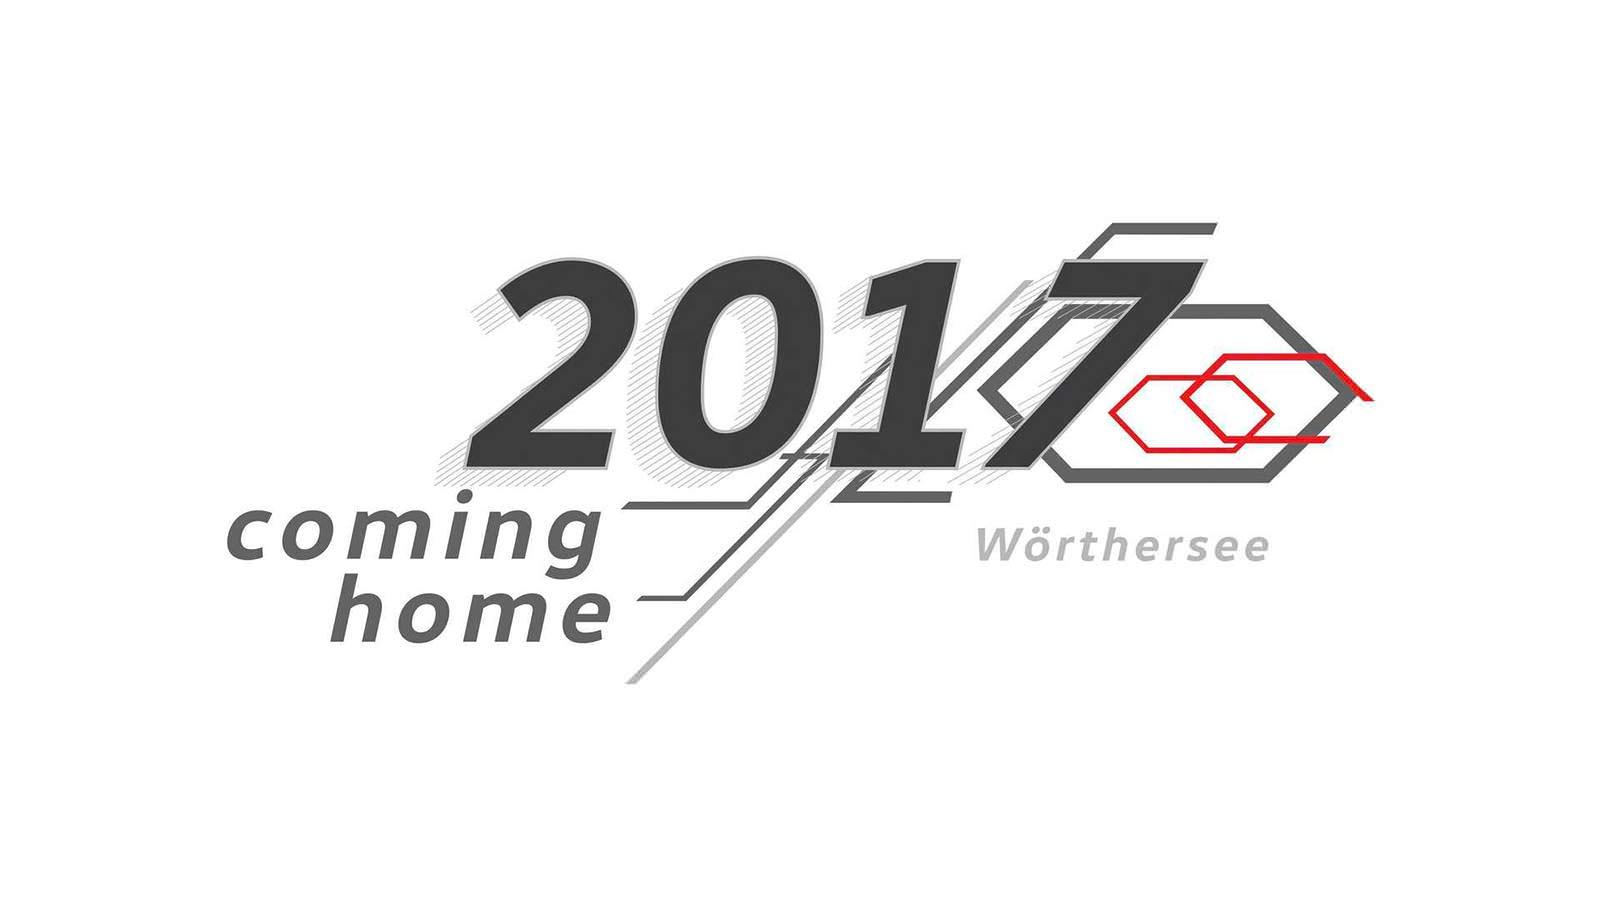 Фестиваль Worthersee 2017 года